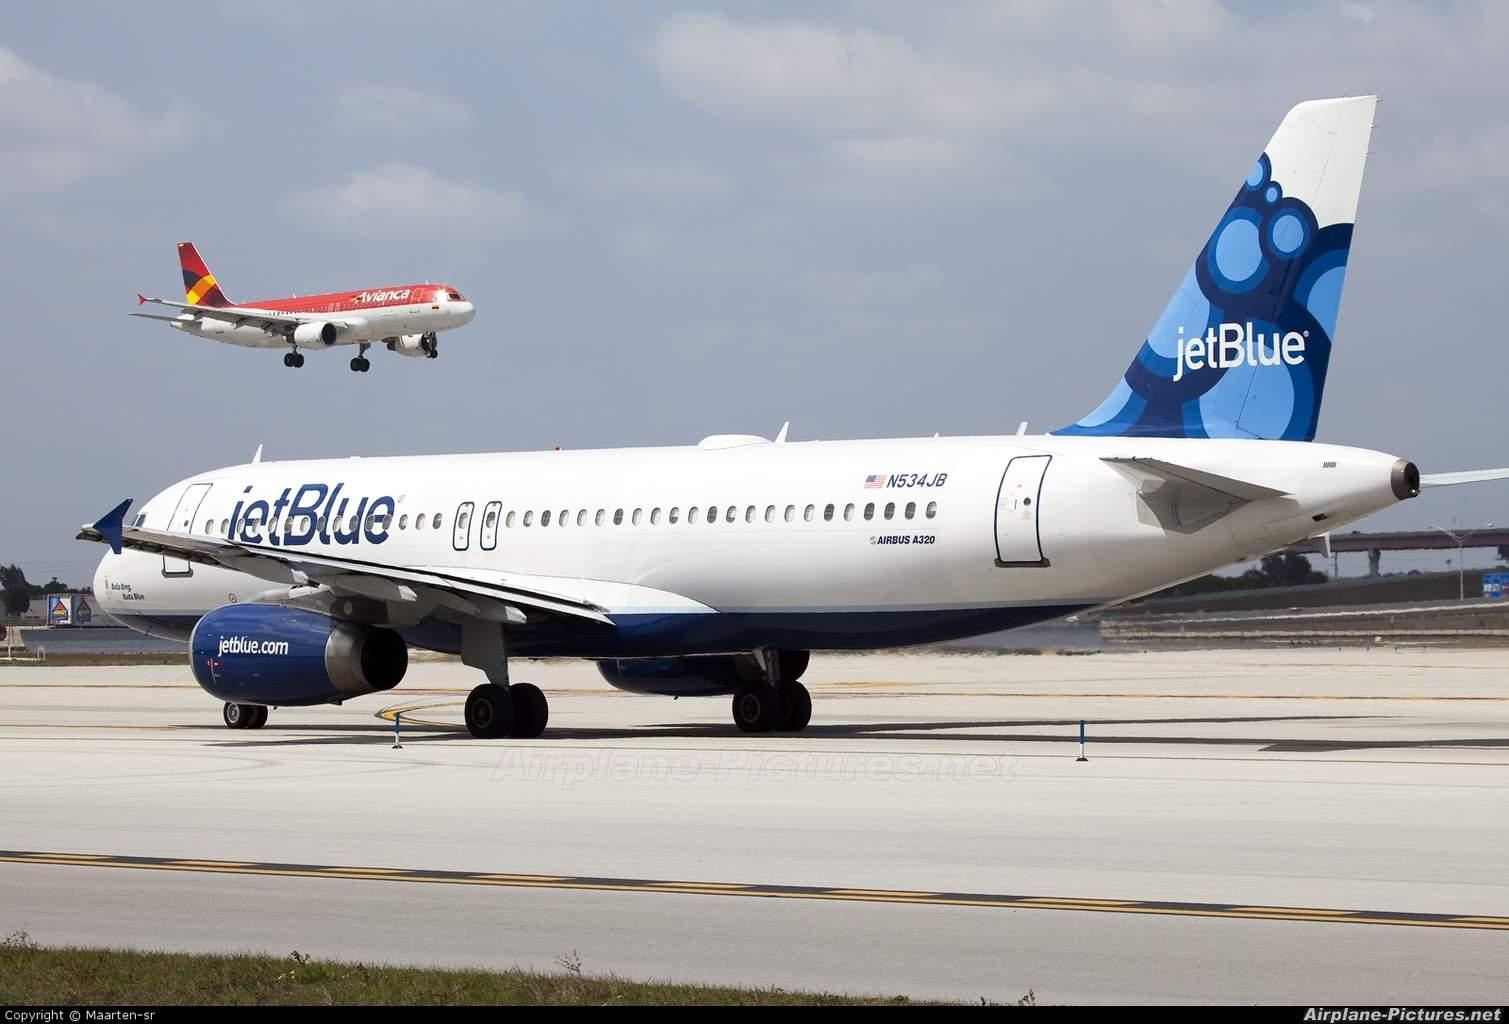 jetBlue starts service to Daytona